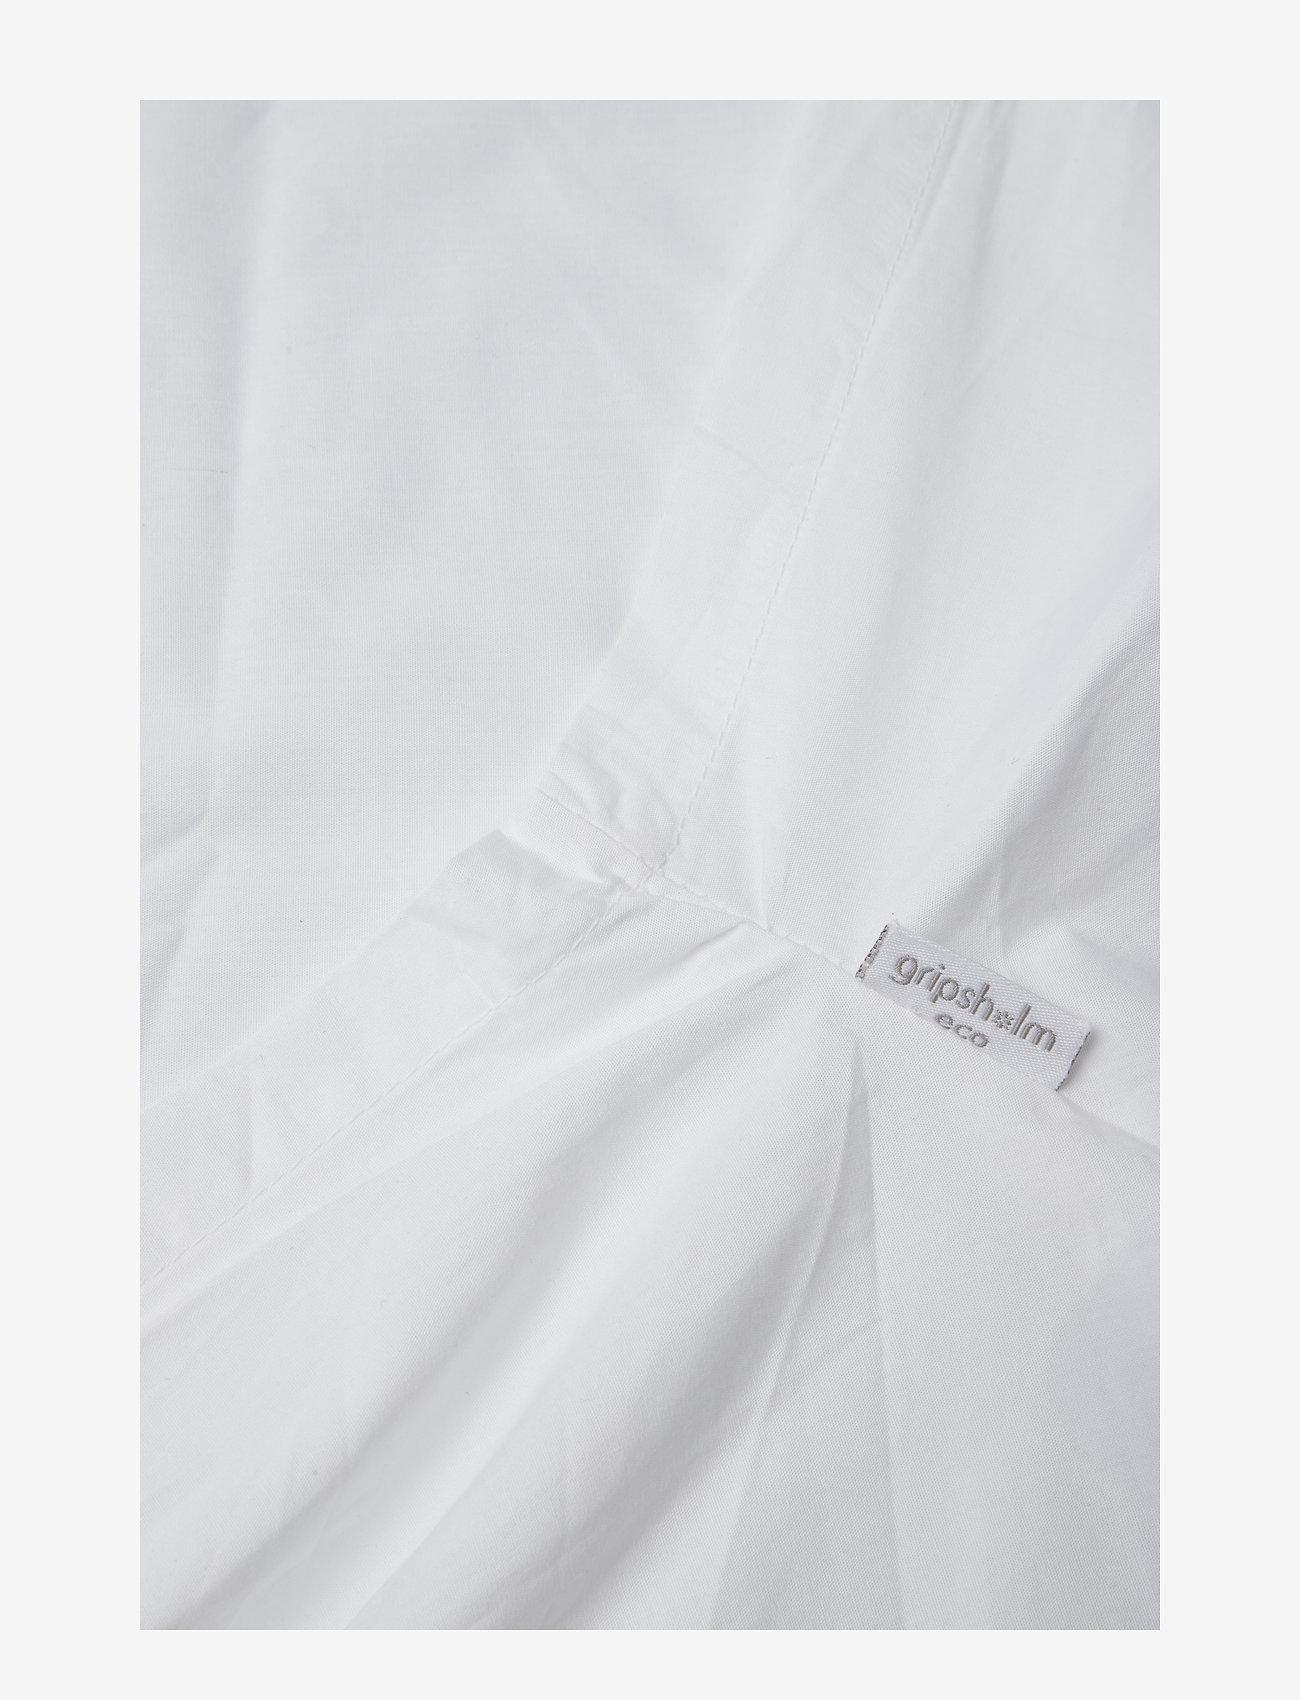 Gripsholm - ENVELOPE SHEET ECO PERCALE - sänglakan - white - 1